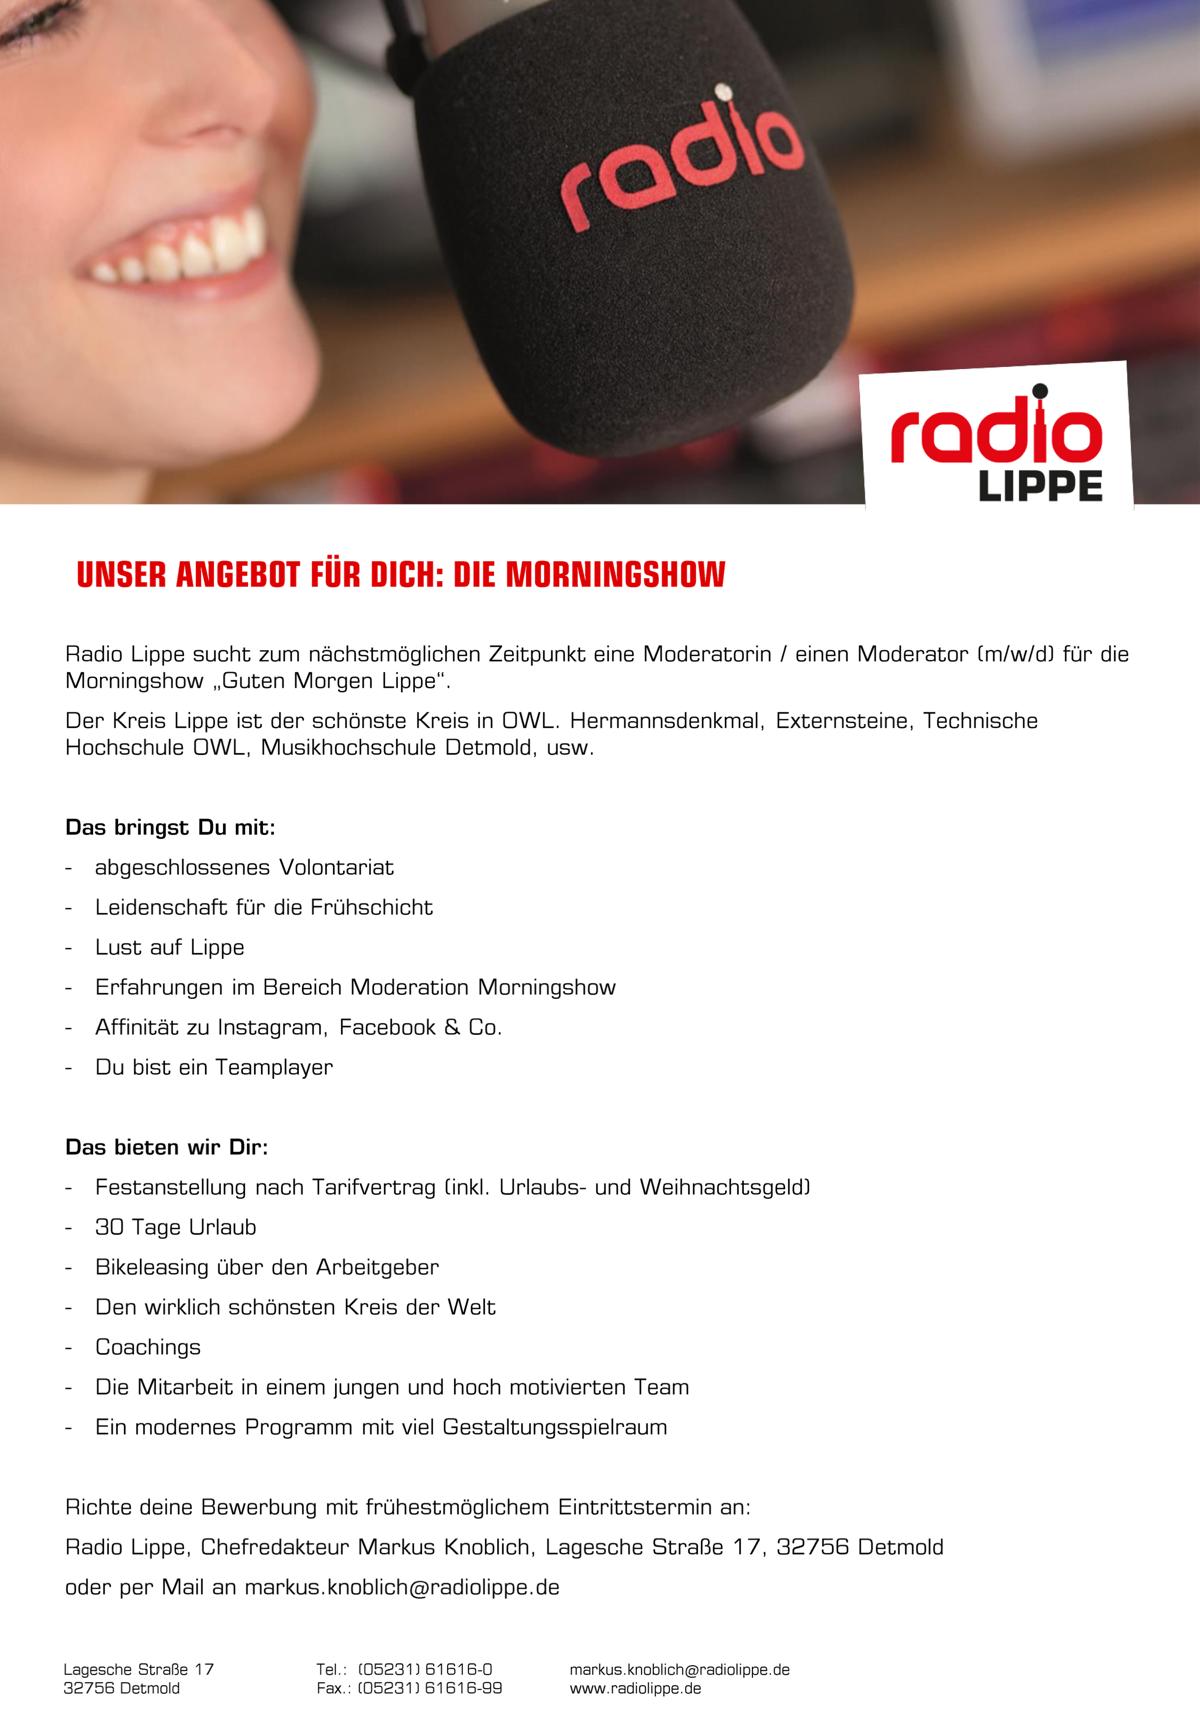 Radio Lippe sucht Moderator/in (m/w/d)